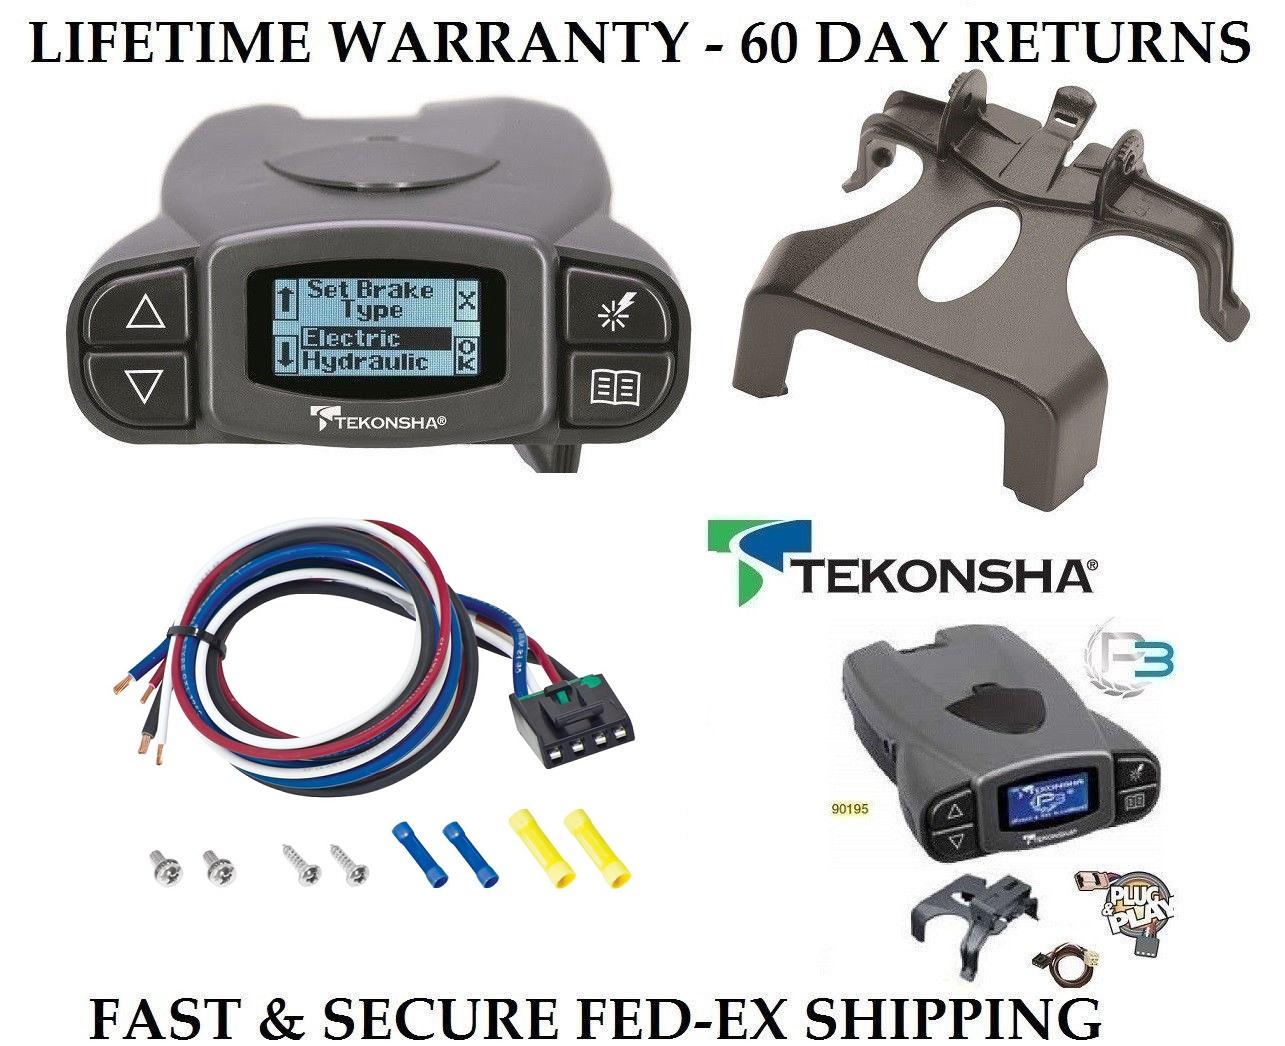 Tekonsha Prodigy P3 Electric Brake Controller Control Module Trailer Brakes Towing Kit Box System Truck Car SUV 90195